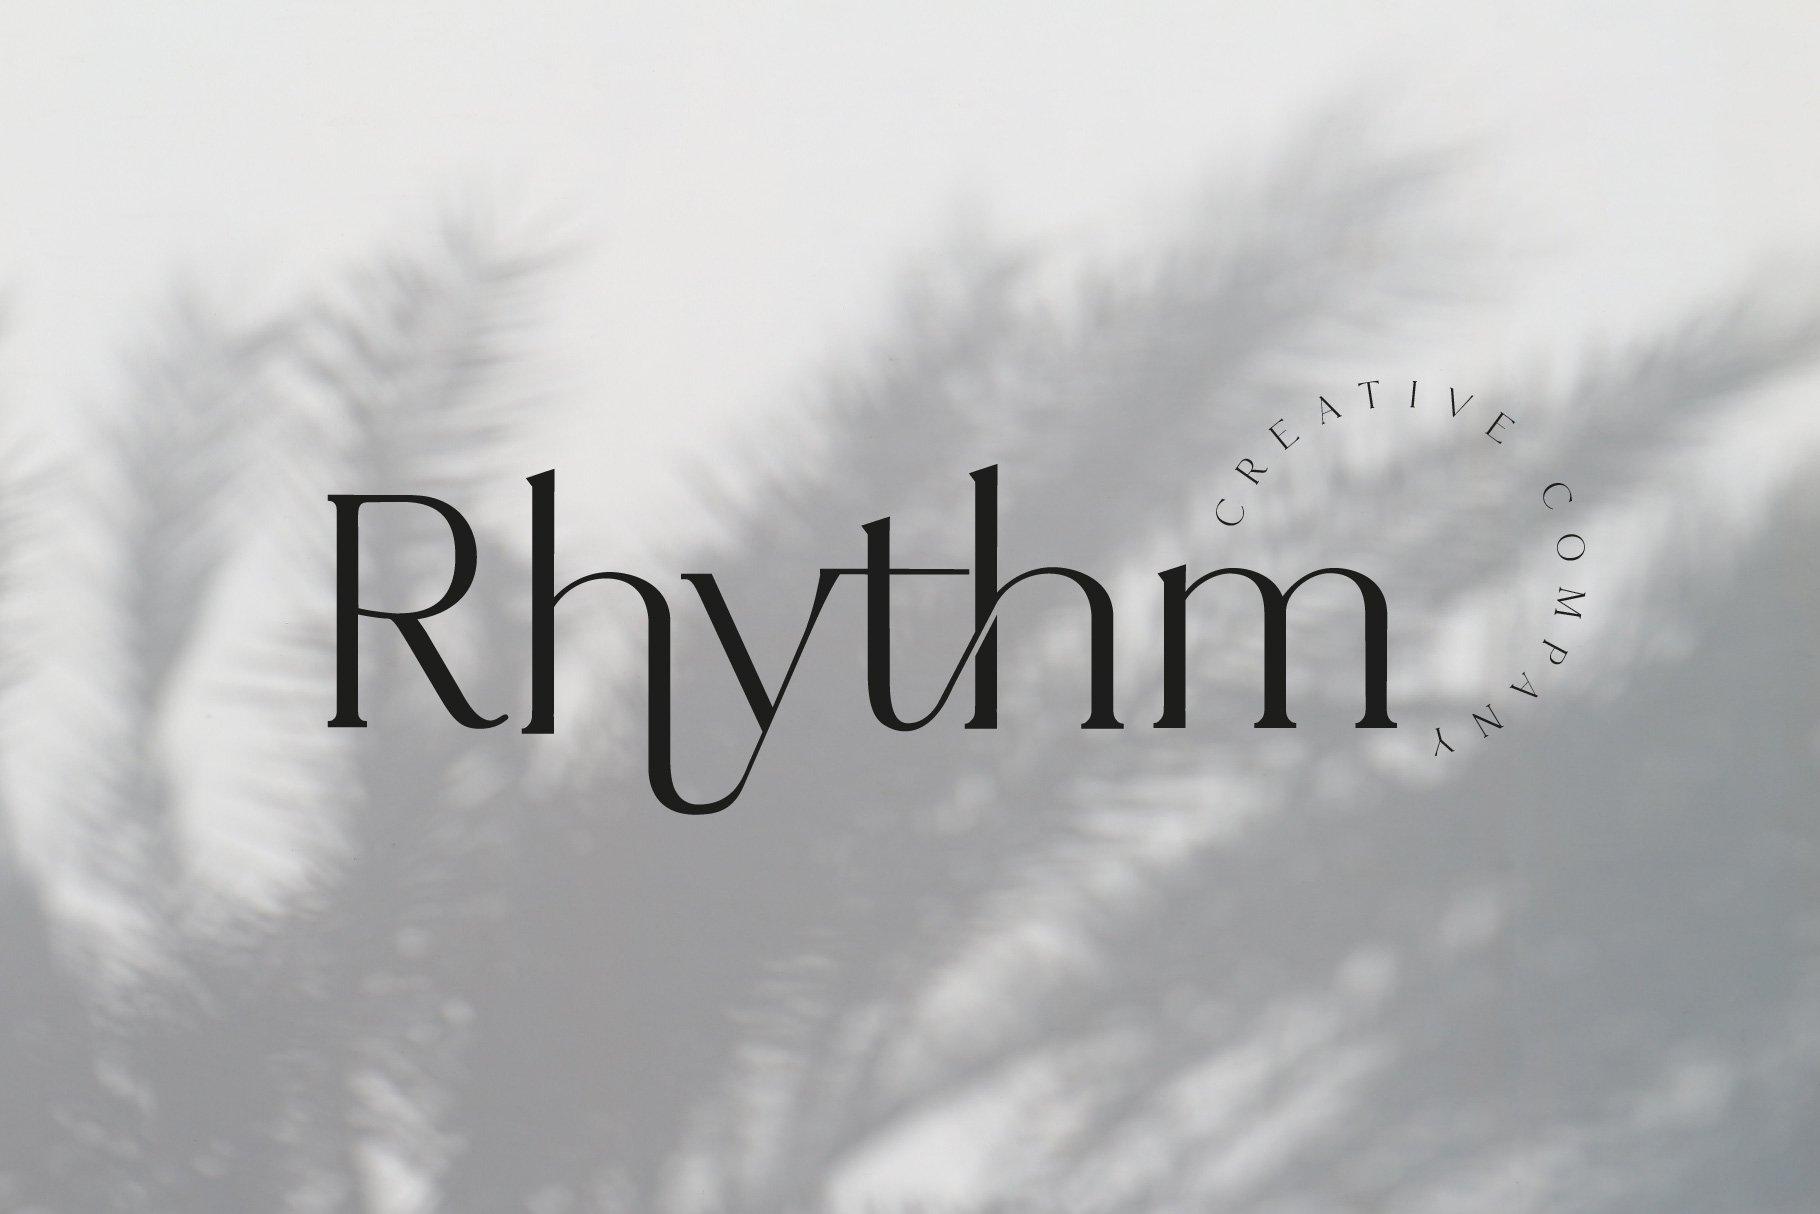 Hunter-Serif-Ligature-Font-www.mockuphill.com